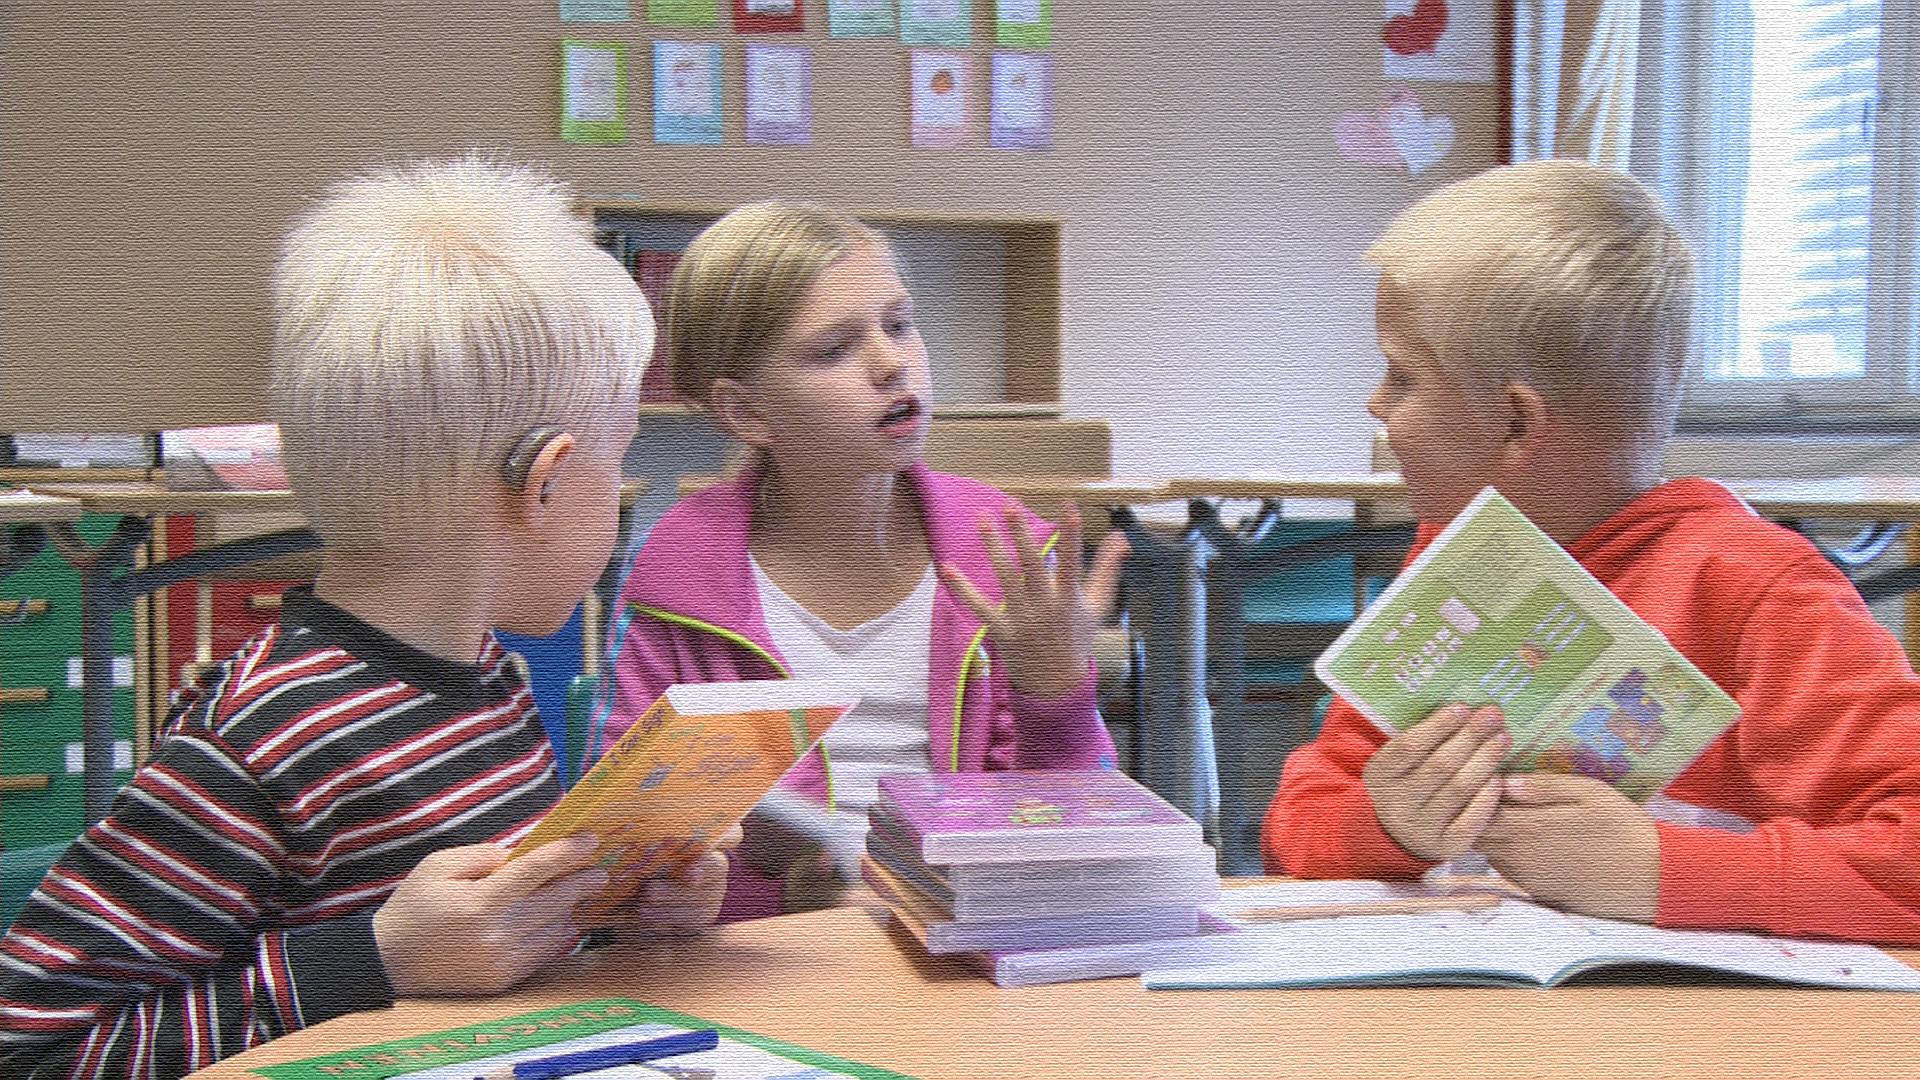 barn diskuterar b